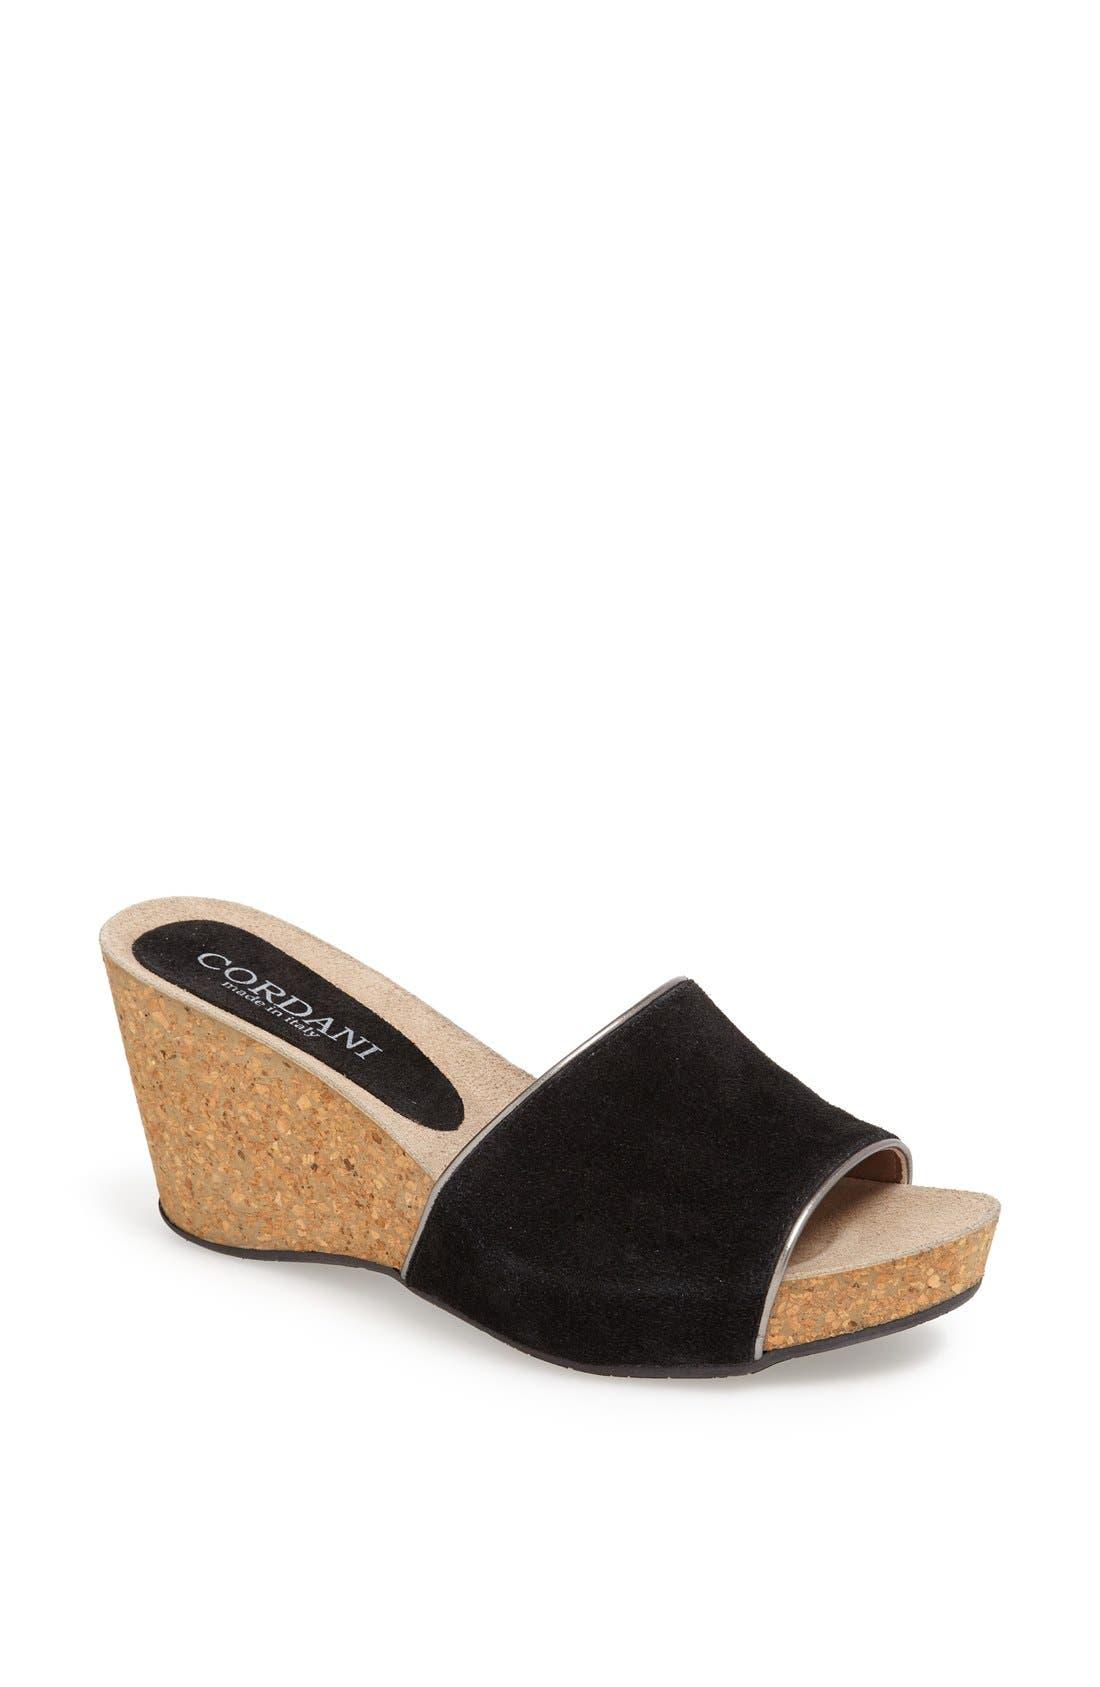 Alternate Image 1 Selected - Cordani 'Abby' Sandal